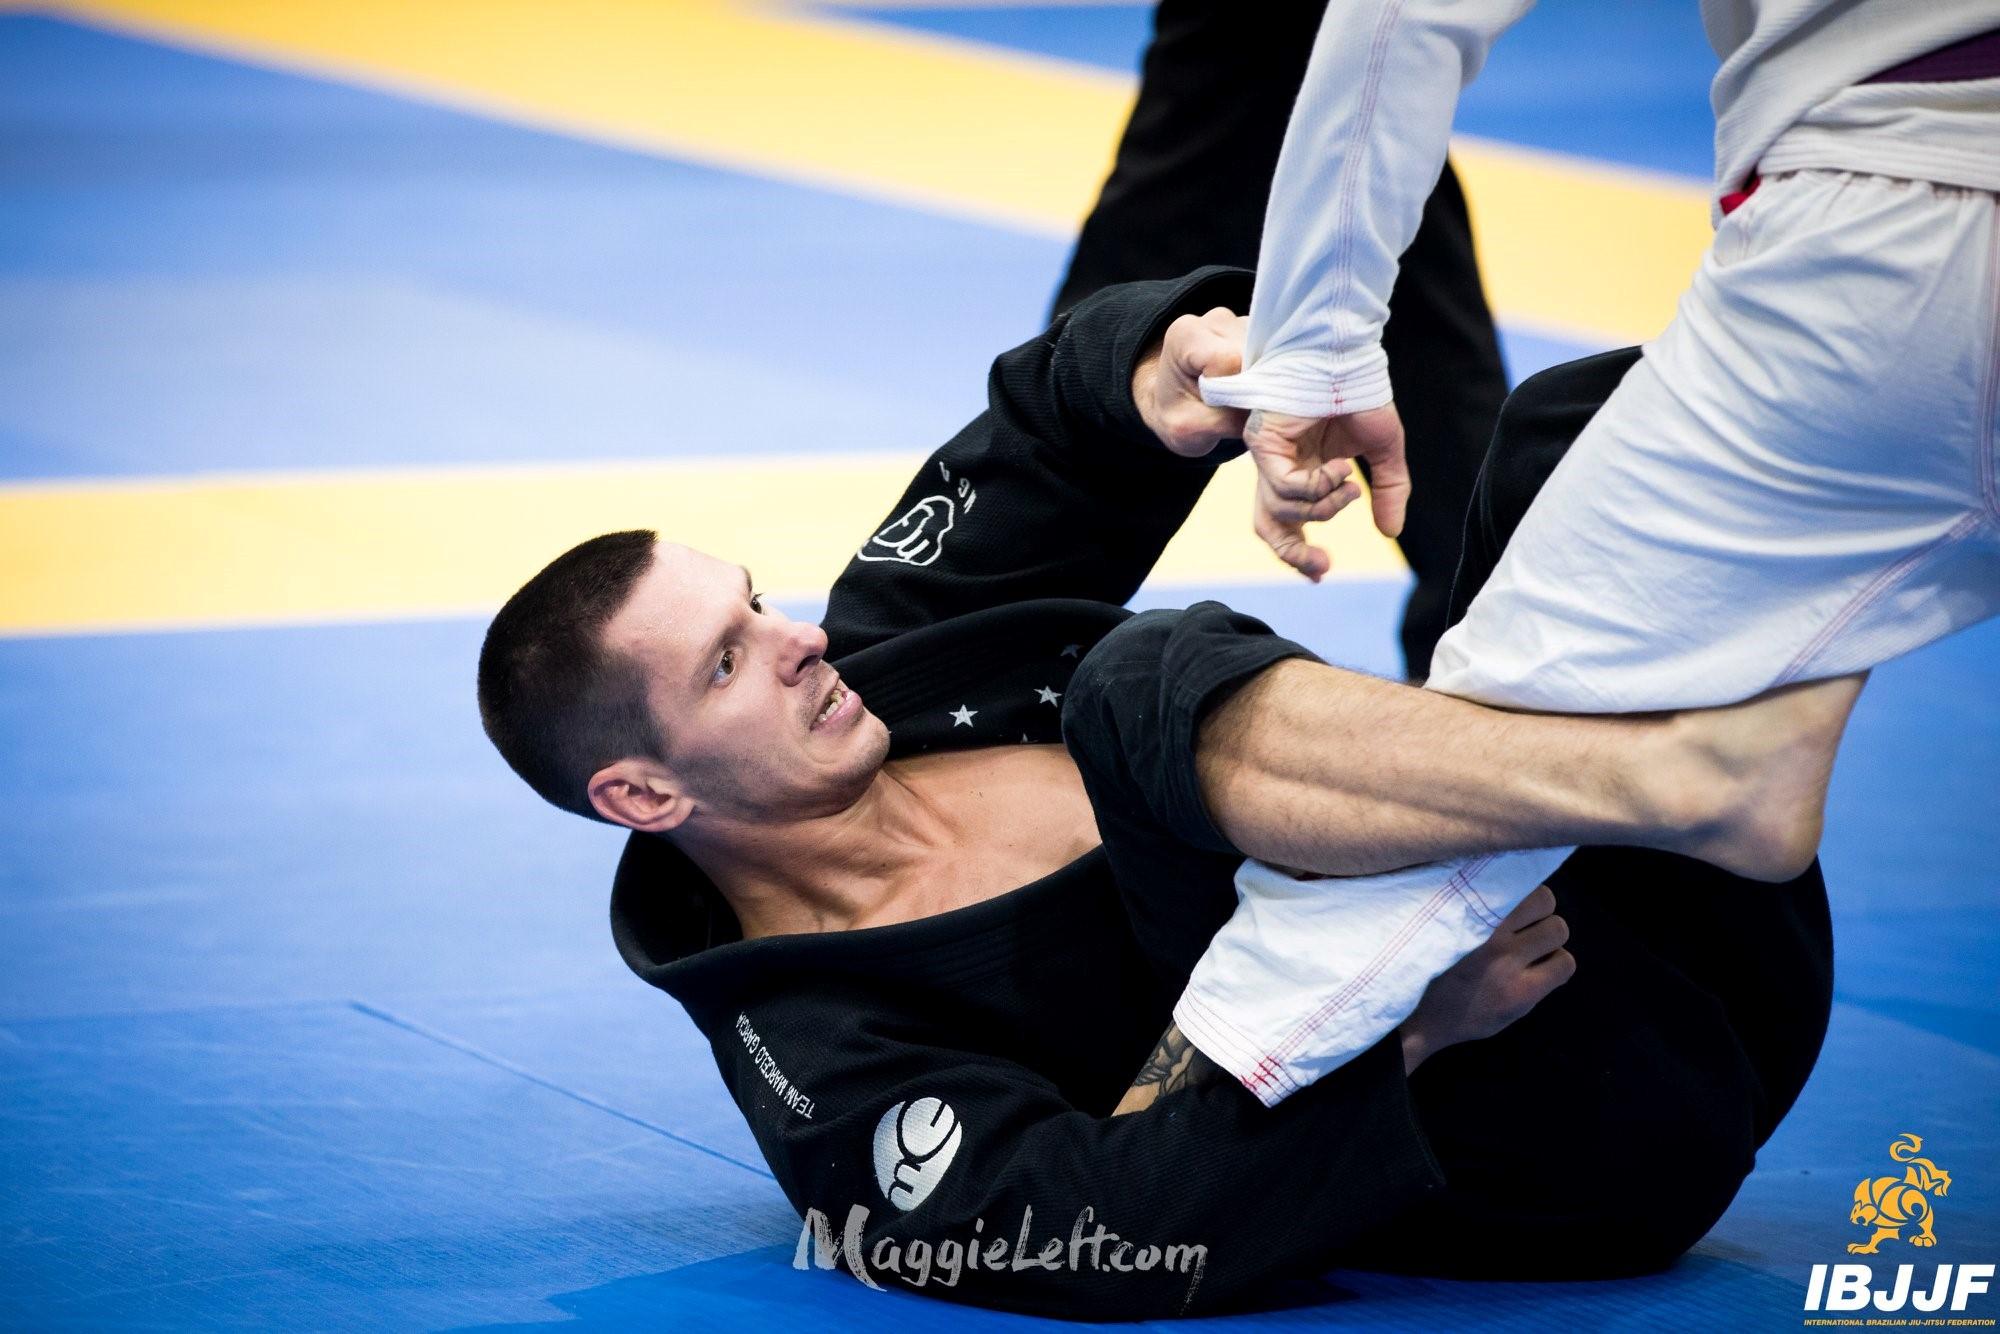 Чемпионат Европы IBJJF в Португалии 2020